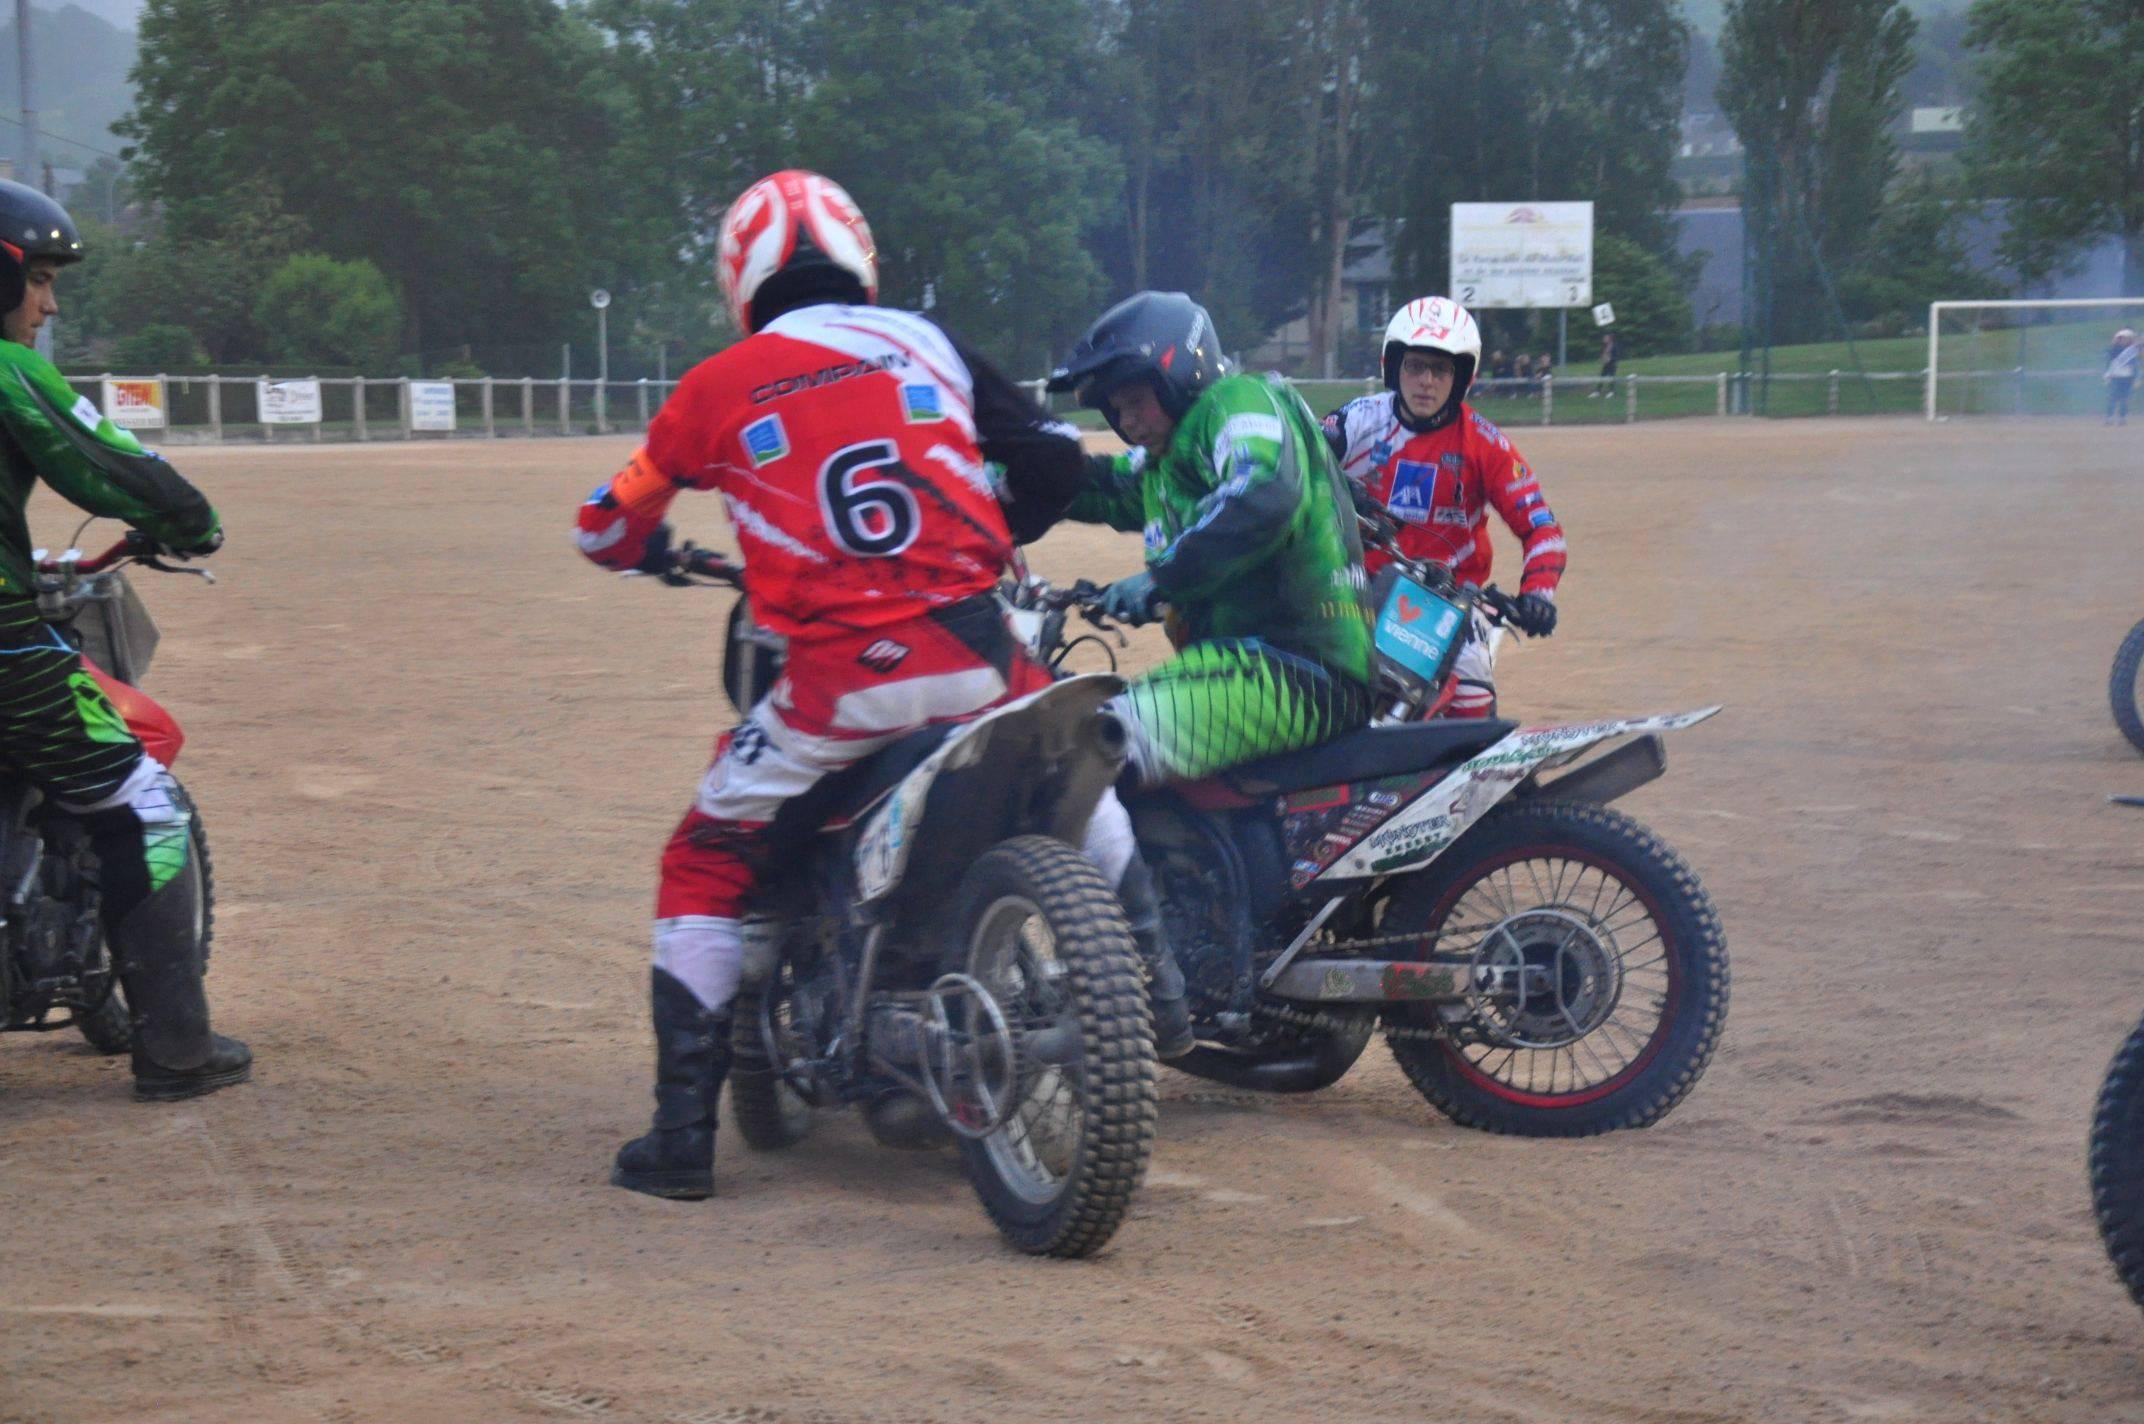 Match de motoball Houlgate-Voujeaucourt